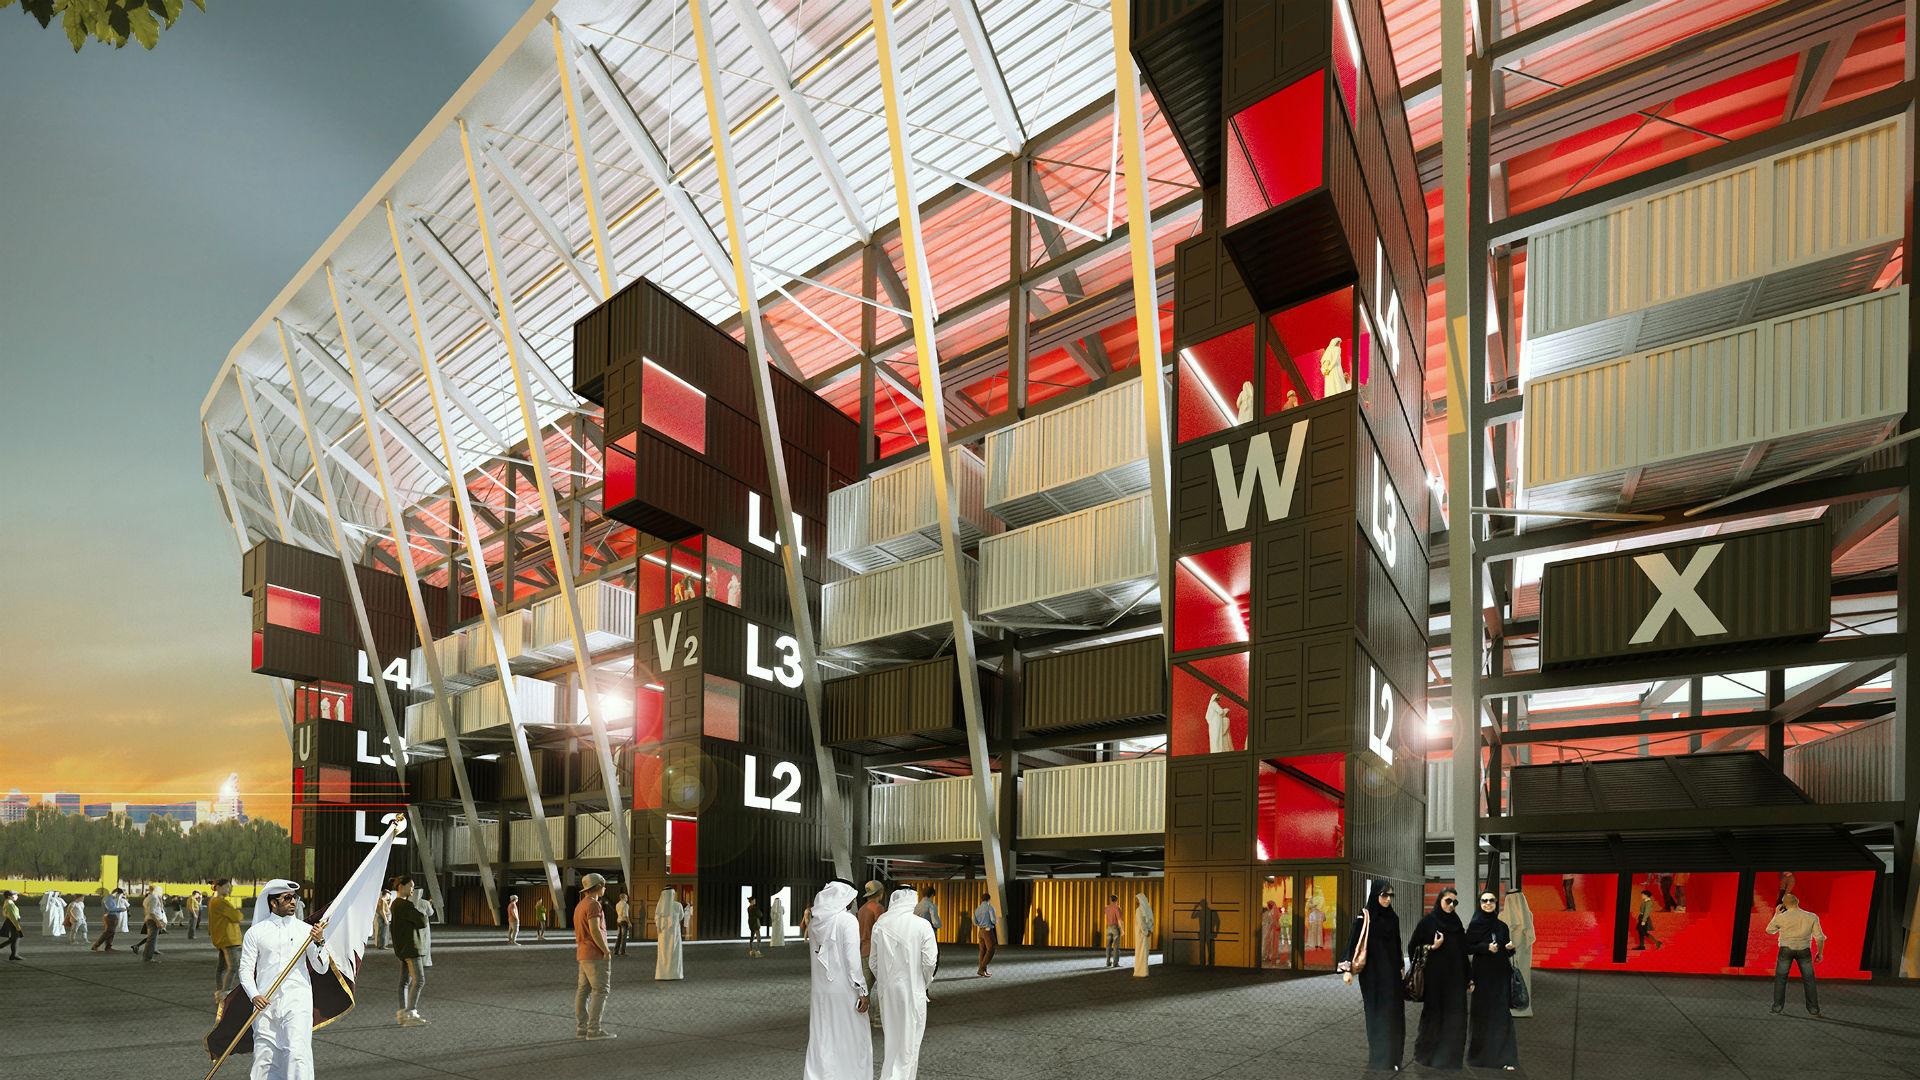 Ras Abu Aboud Stadium Qatar 2022 World Cup